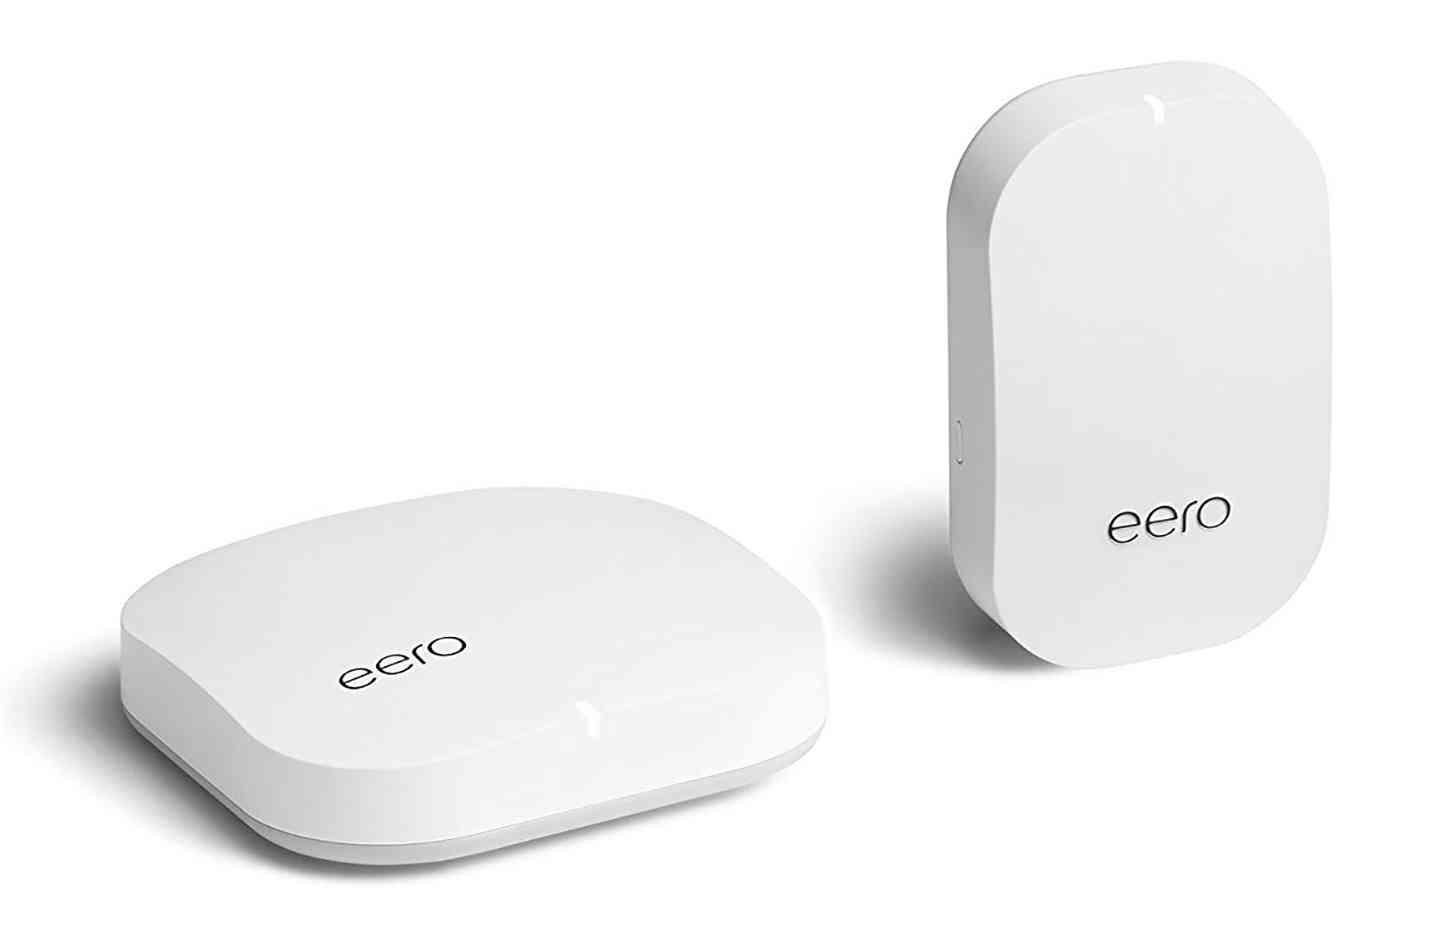 Eero router and beacon